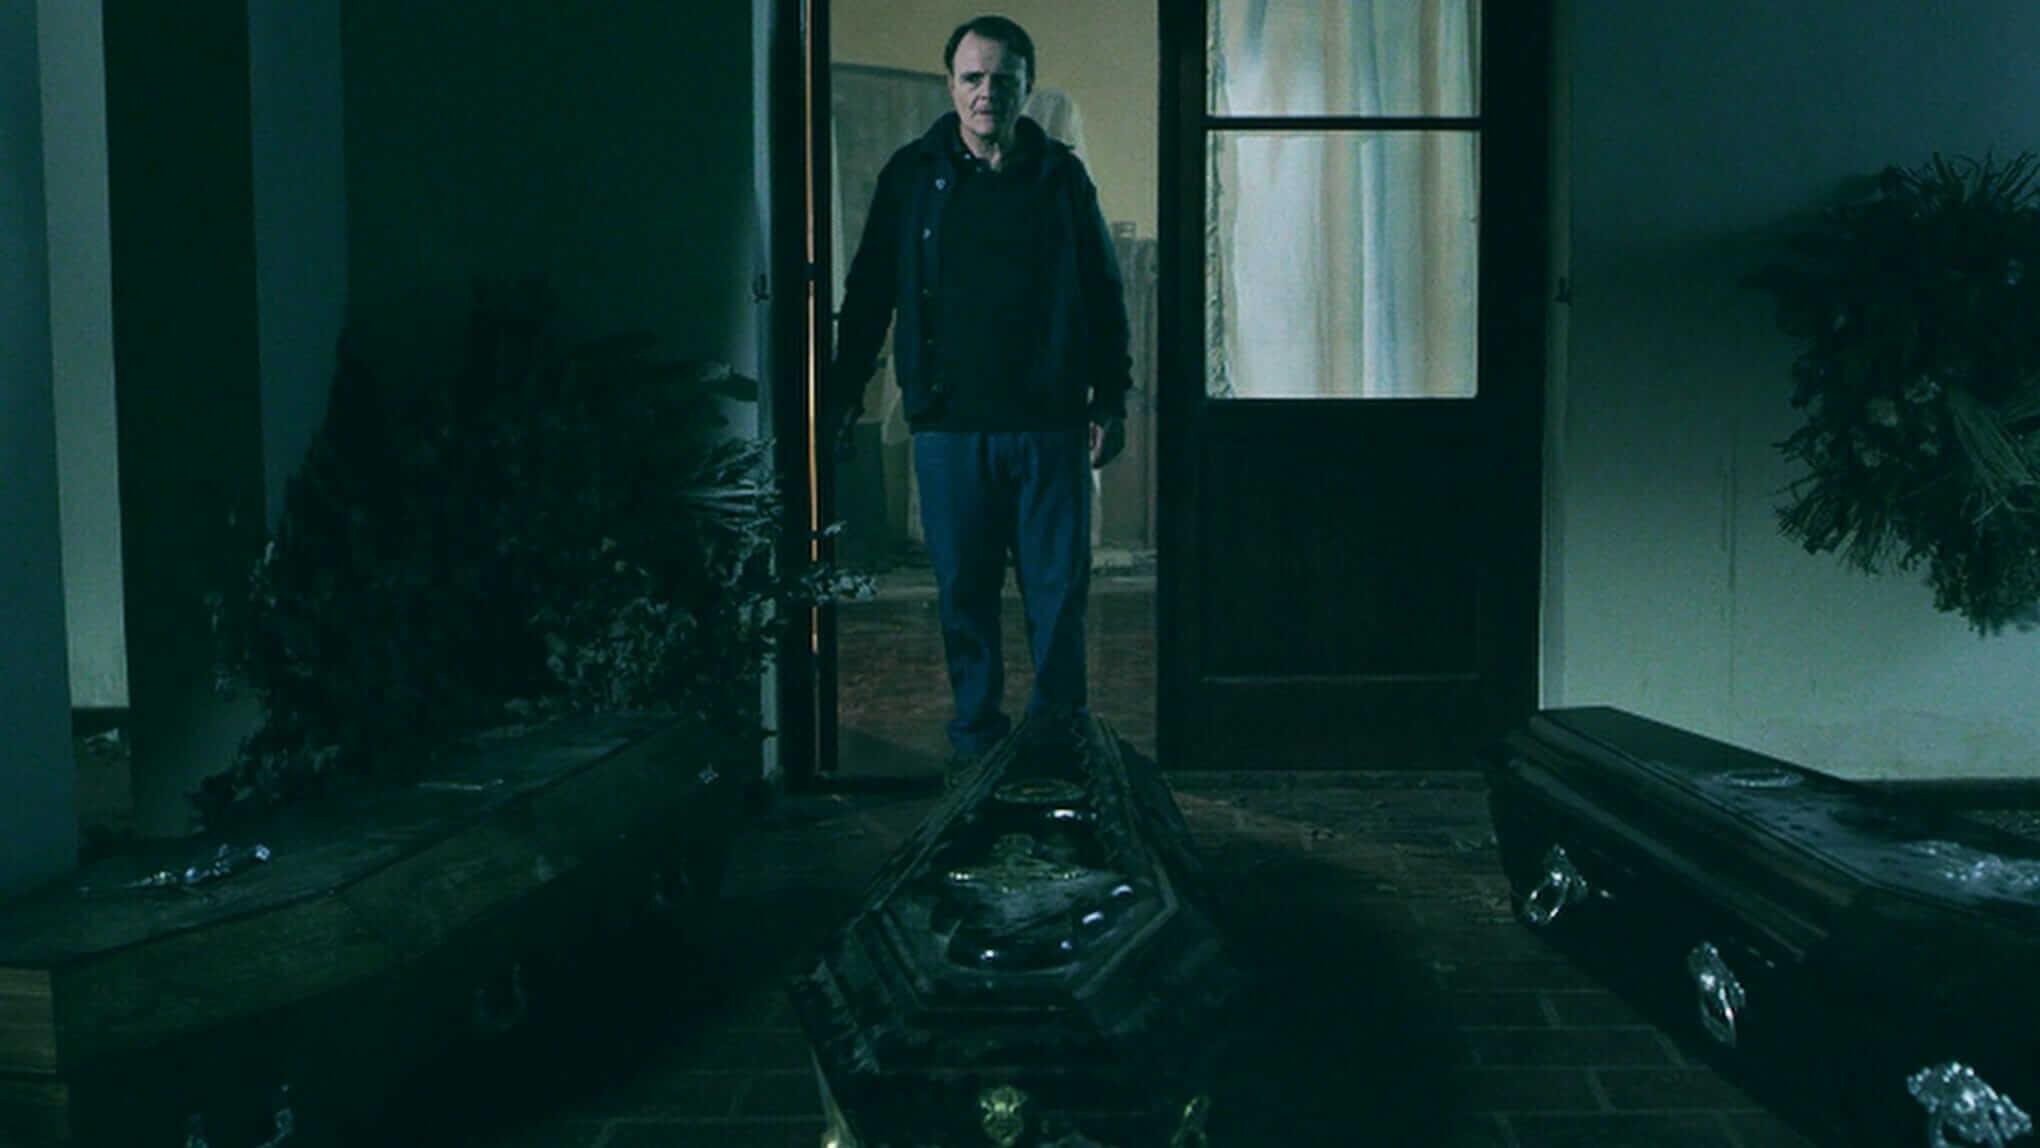 The Undertaker's Home la funeraria review horror movie fantasia 2020